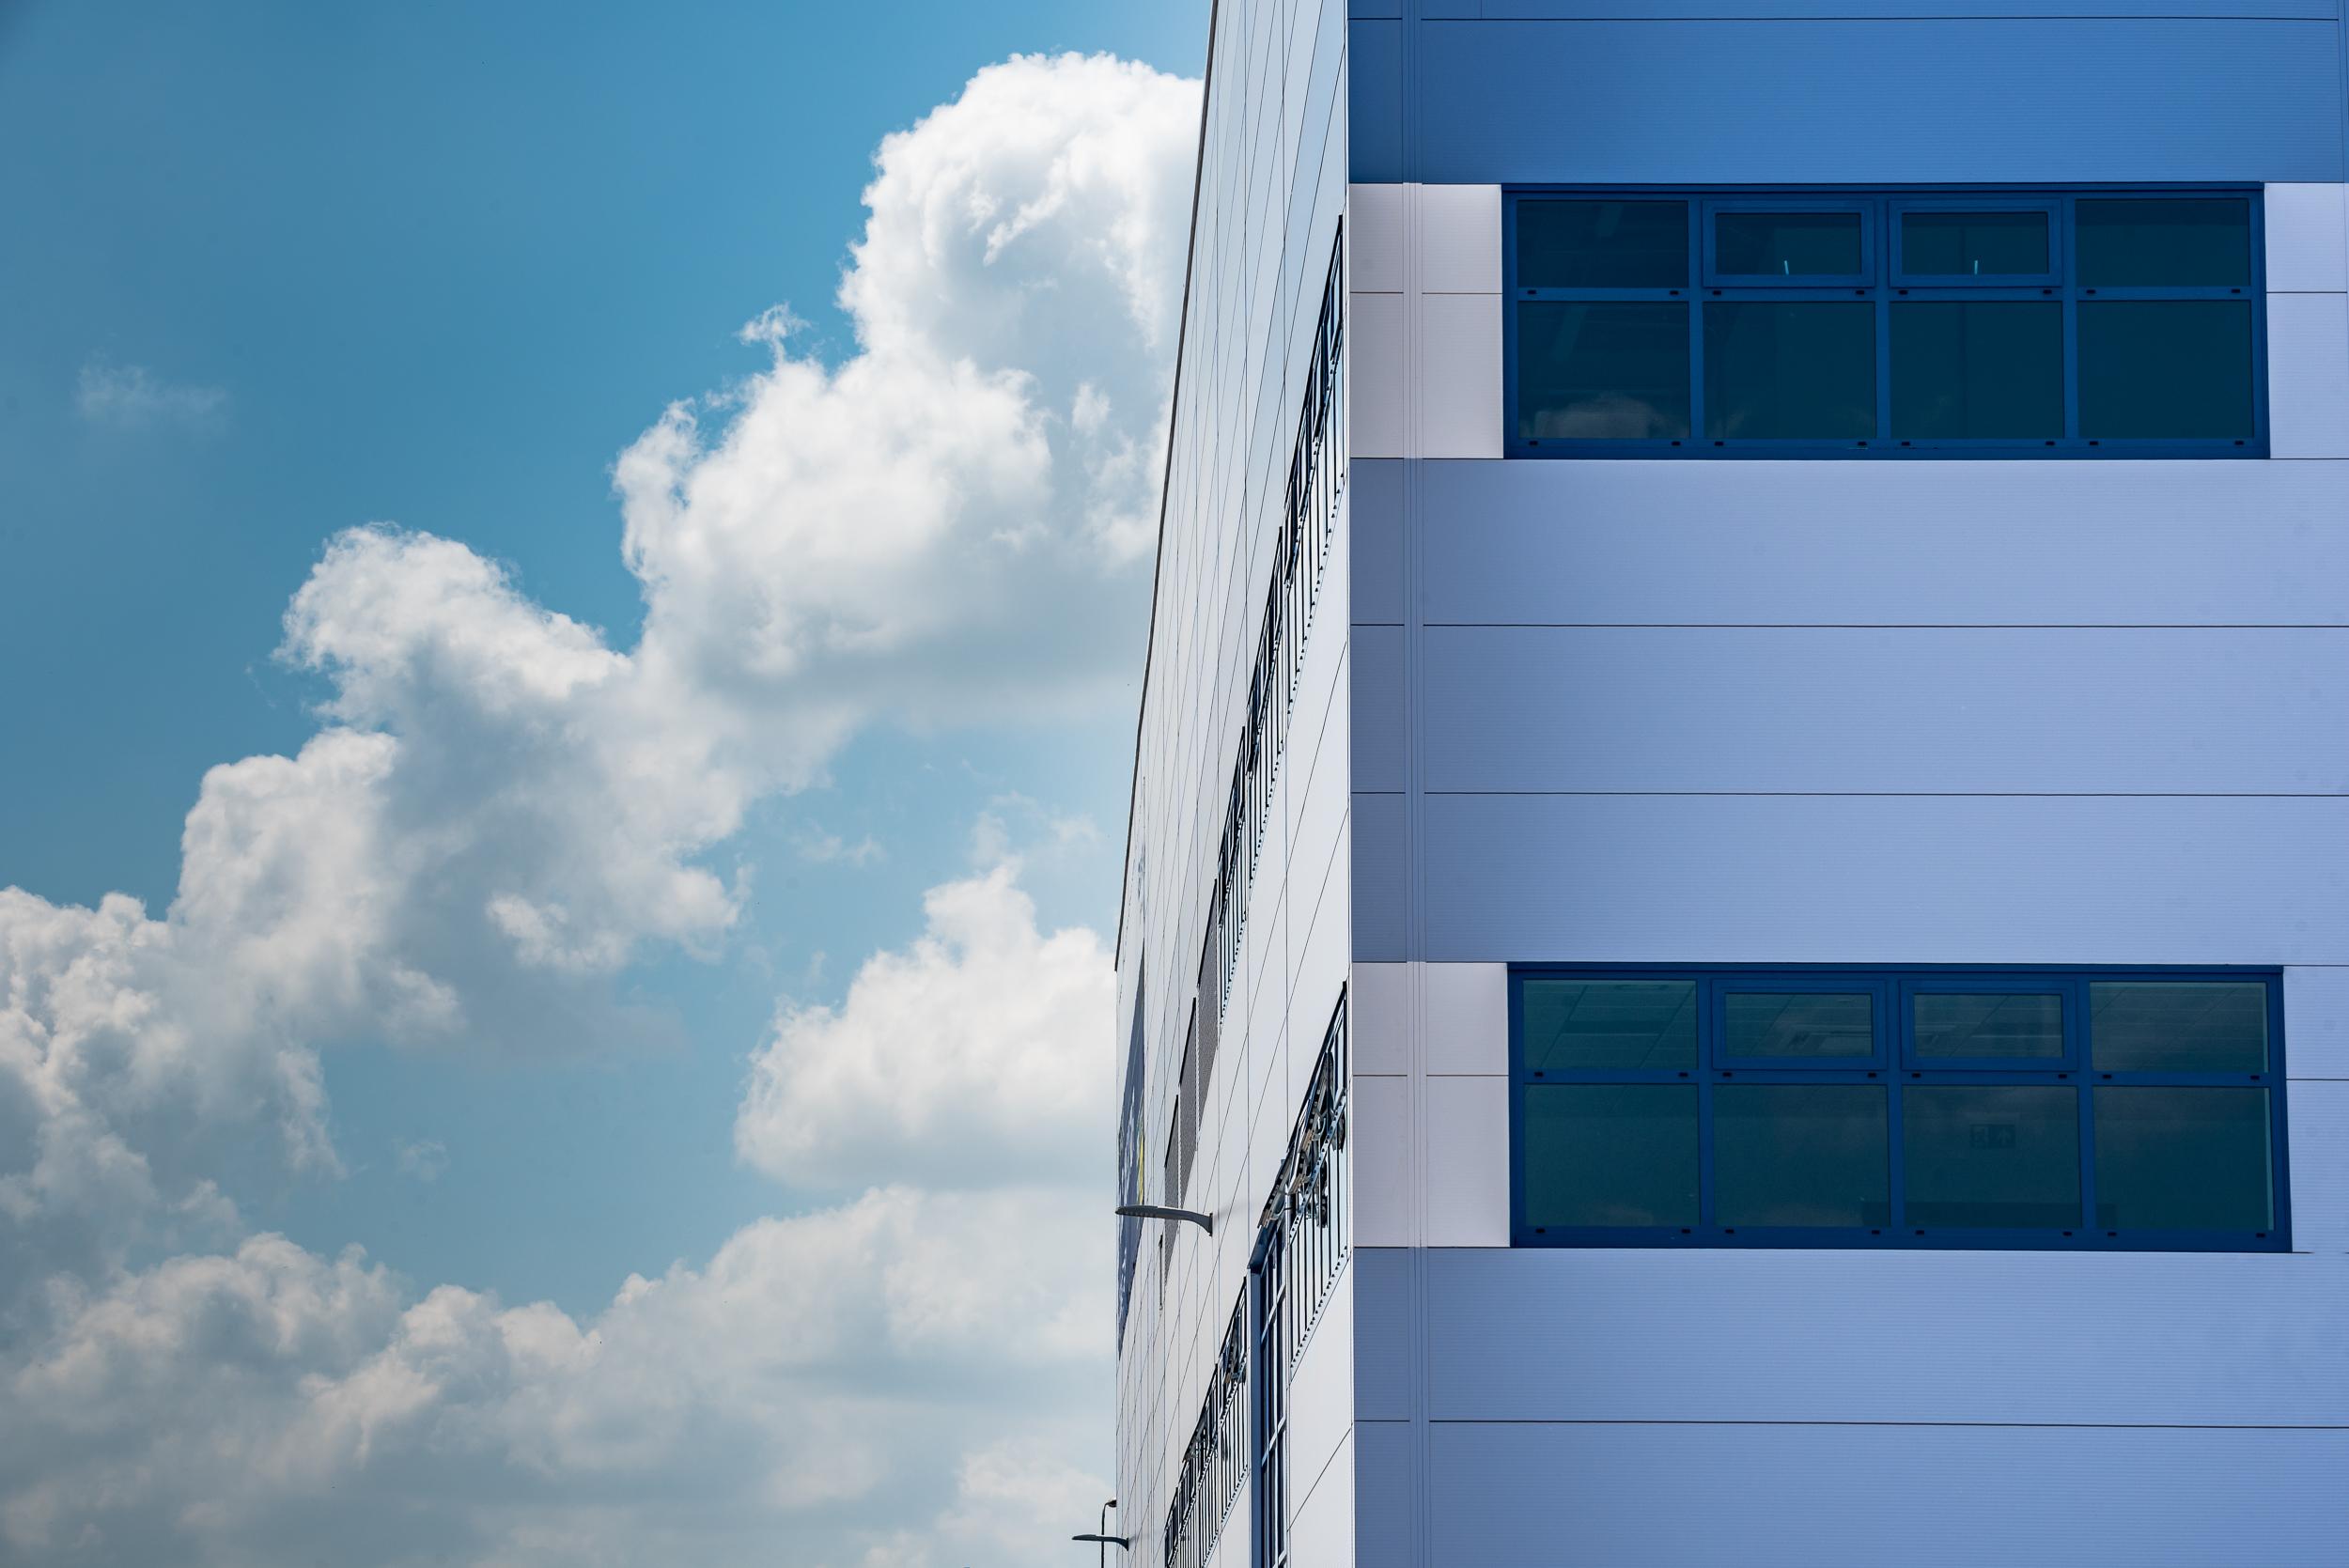 industrial-exterior-6.jpg